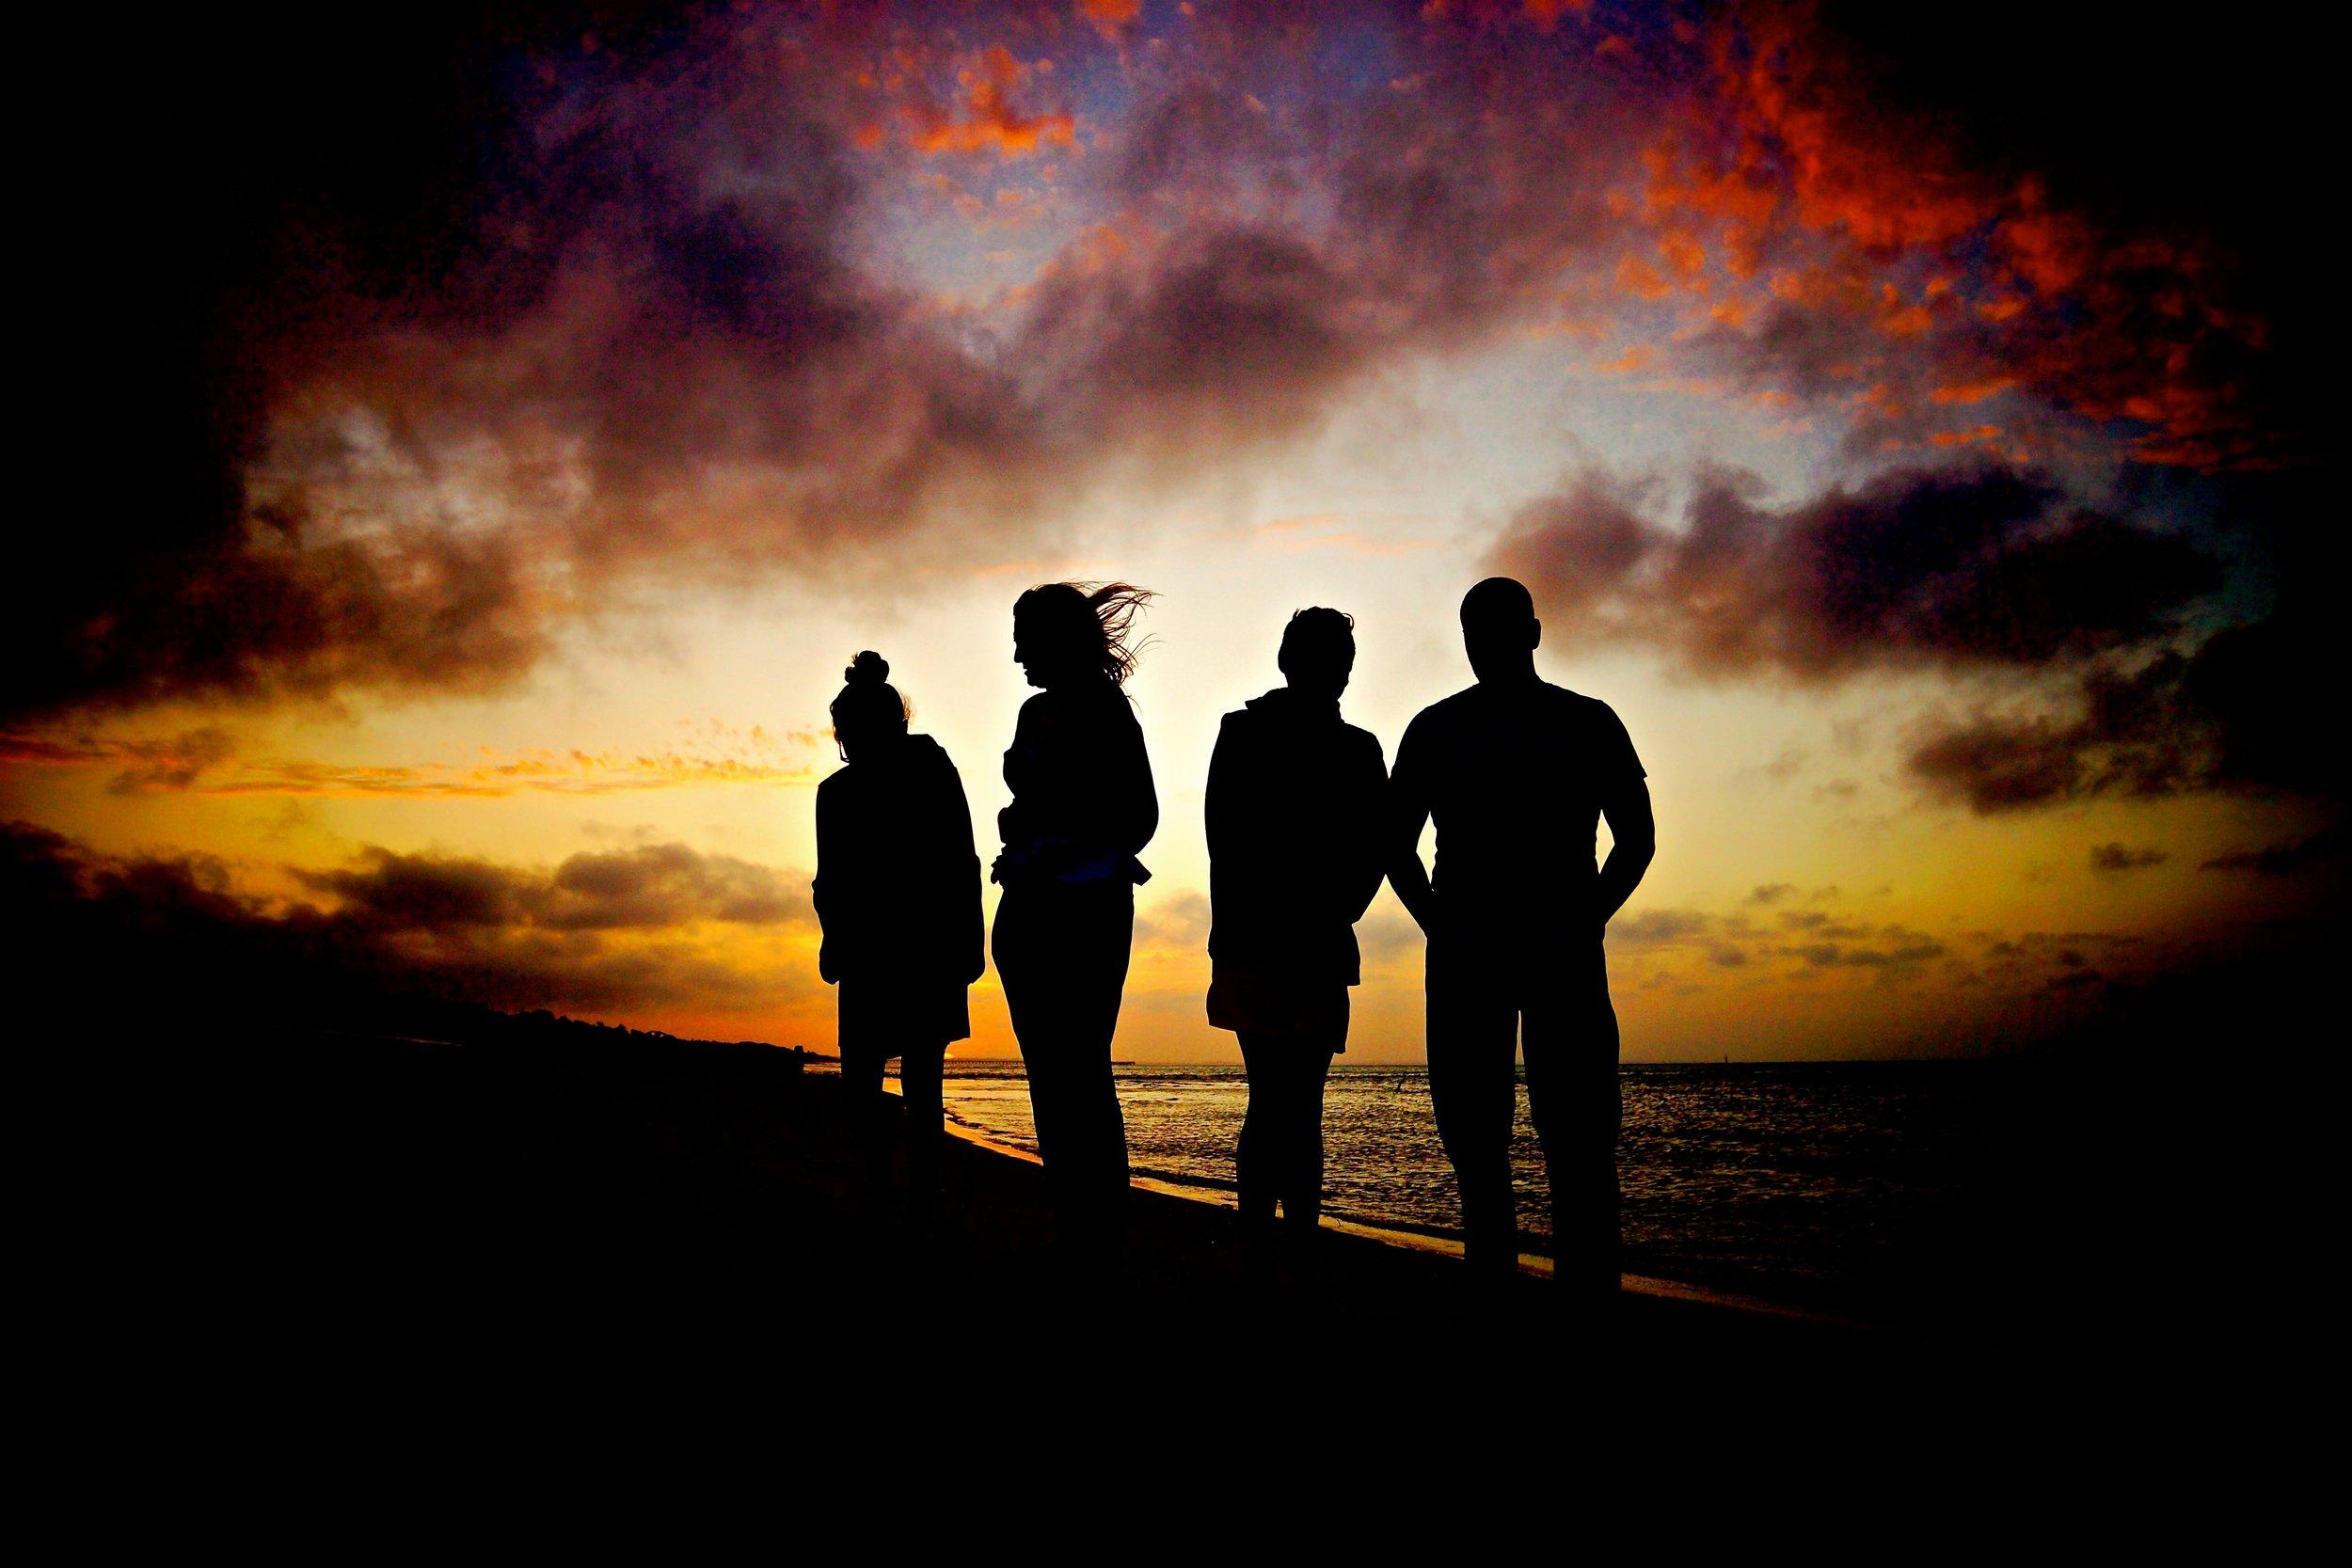 uwm.tribe.beach-landscape-nature-horizon-silhouette-gathering-868640-pxhere.com (1)